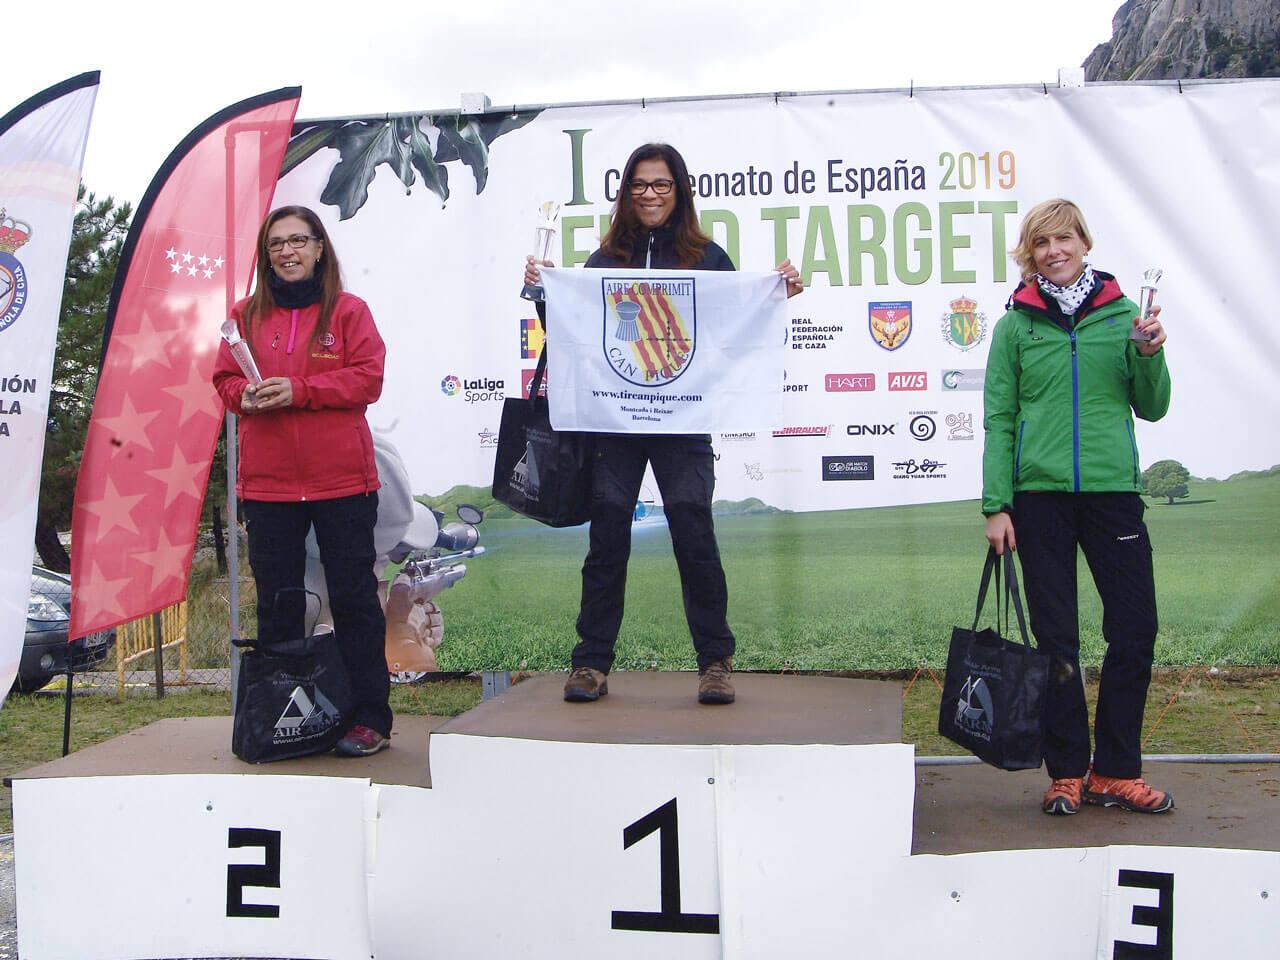 Campeonato de España Field Target 2019 - Podium Damas